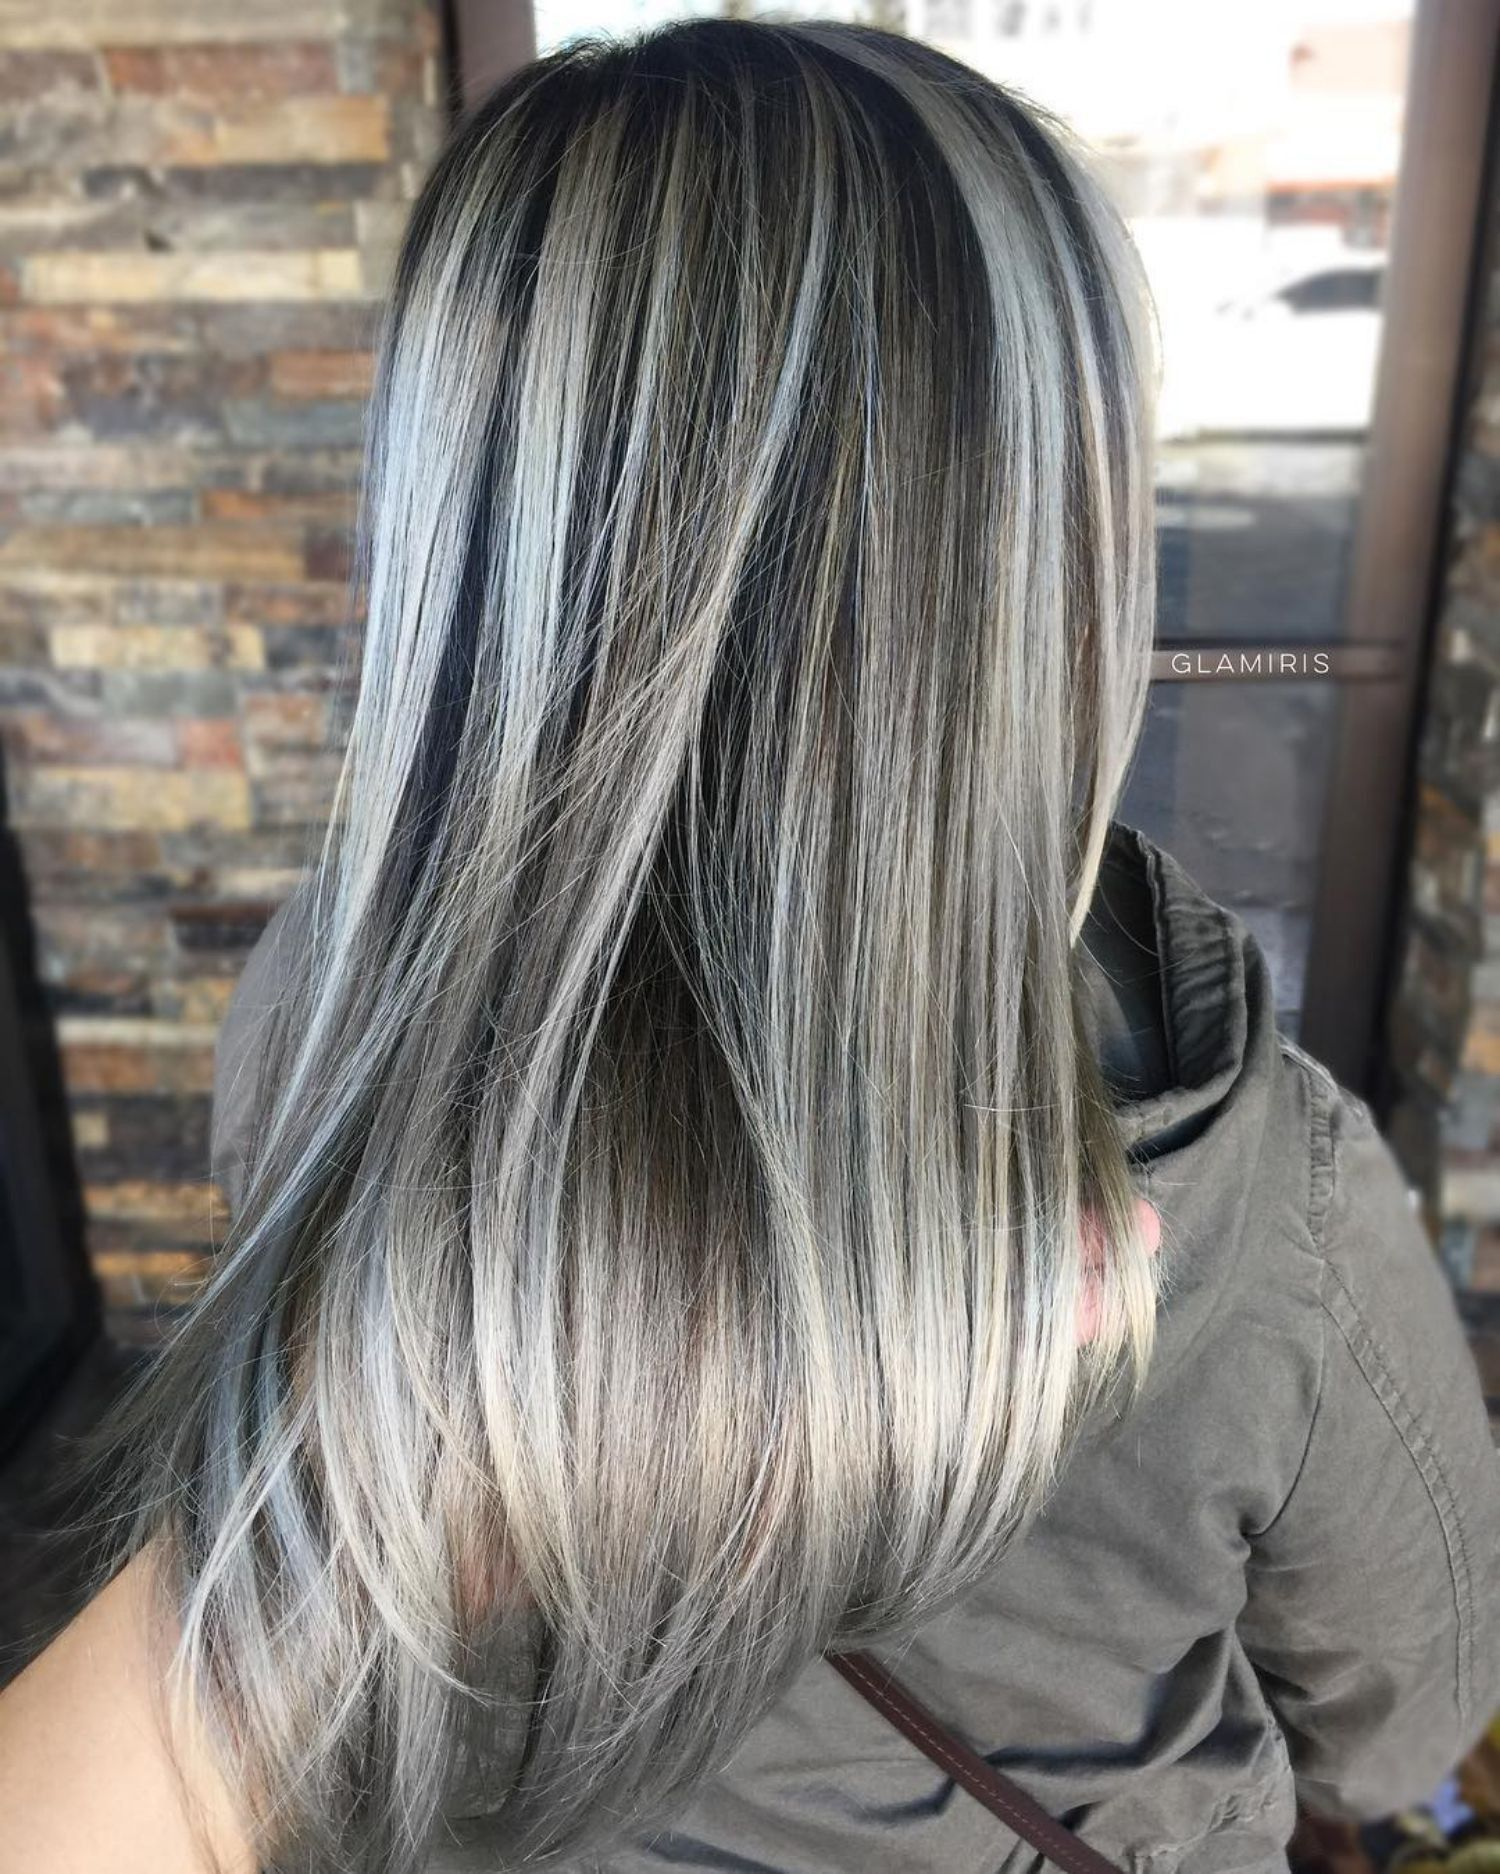 Ideas de como llevar el tono rubio champiñón si usas cabello lacio